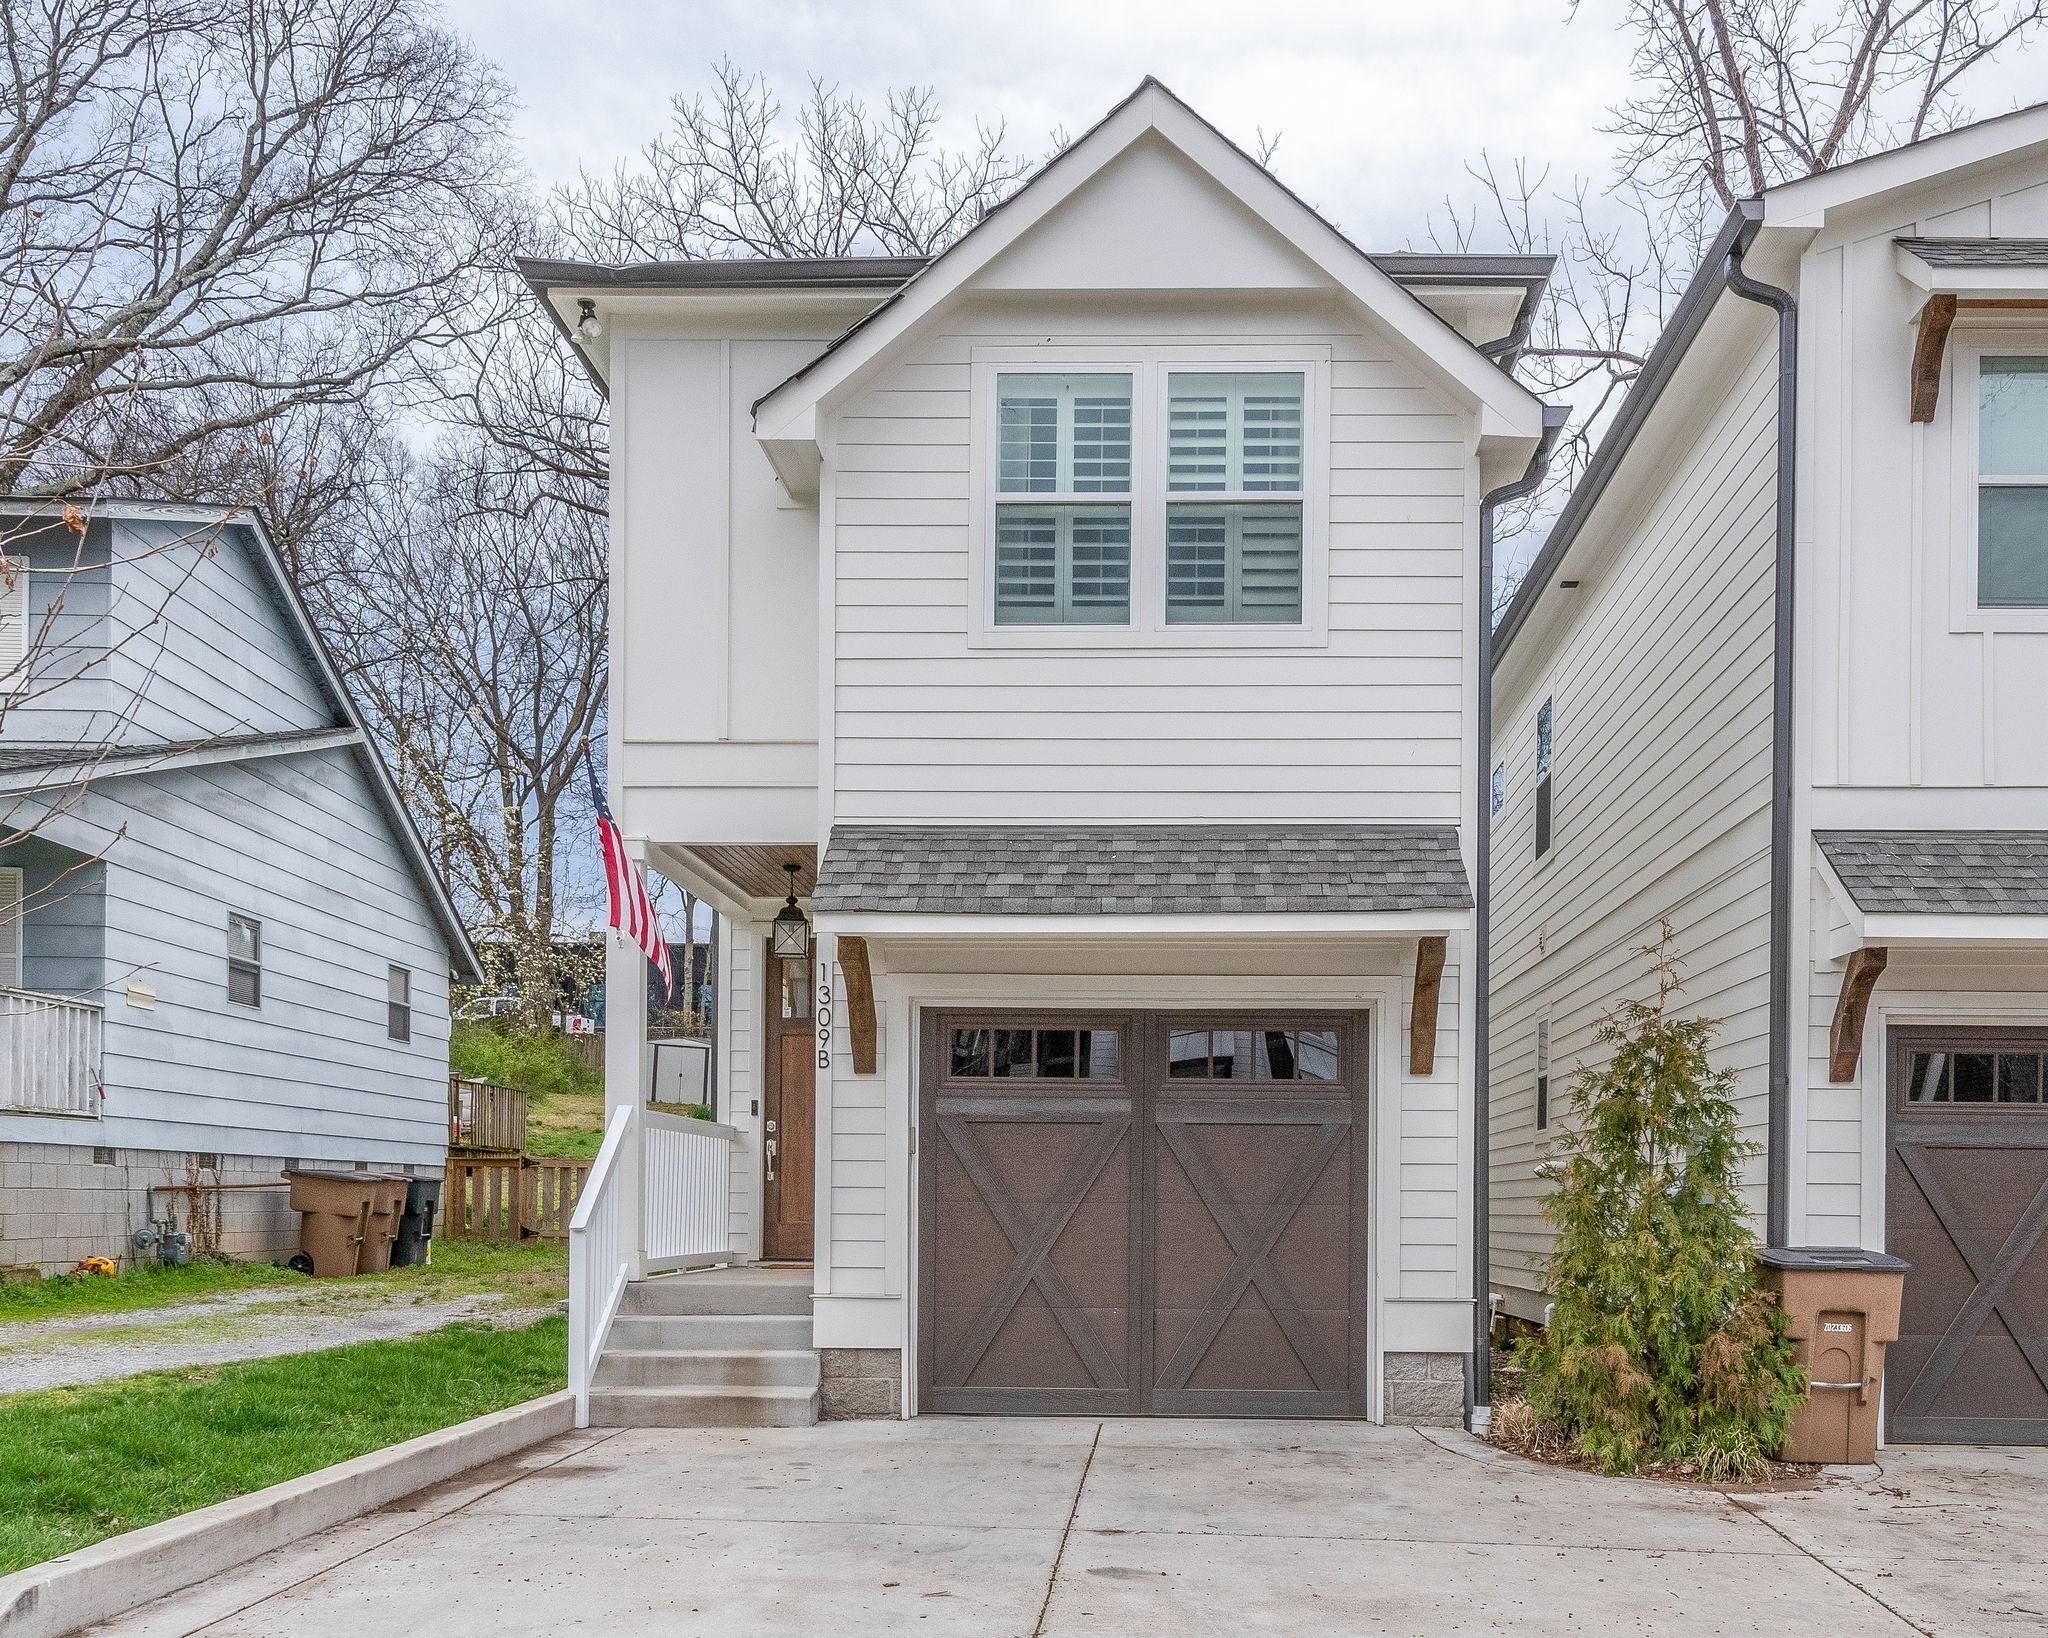 1309B Pillow Street, Nashville, TN 37203 - Nashville, TN real estate listing